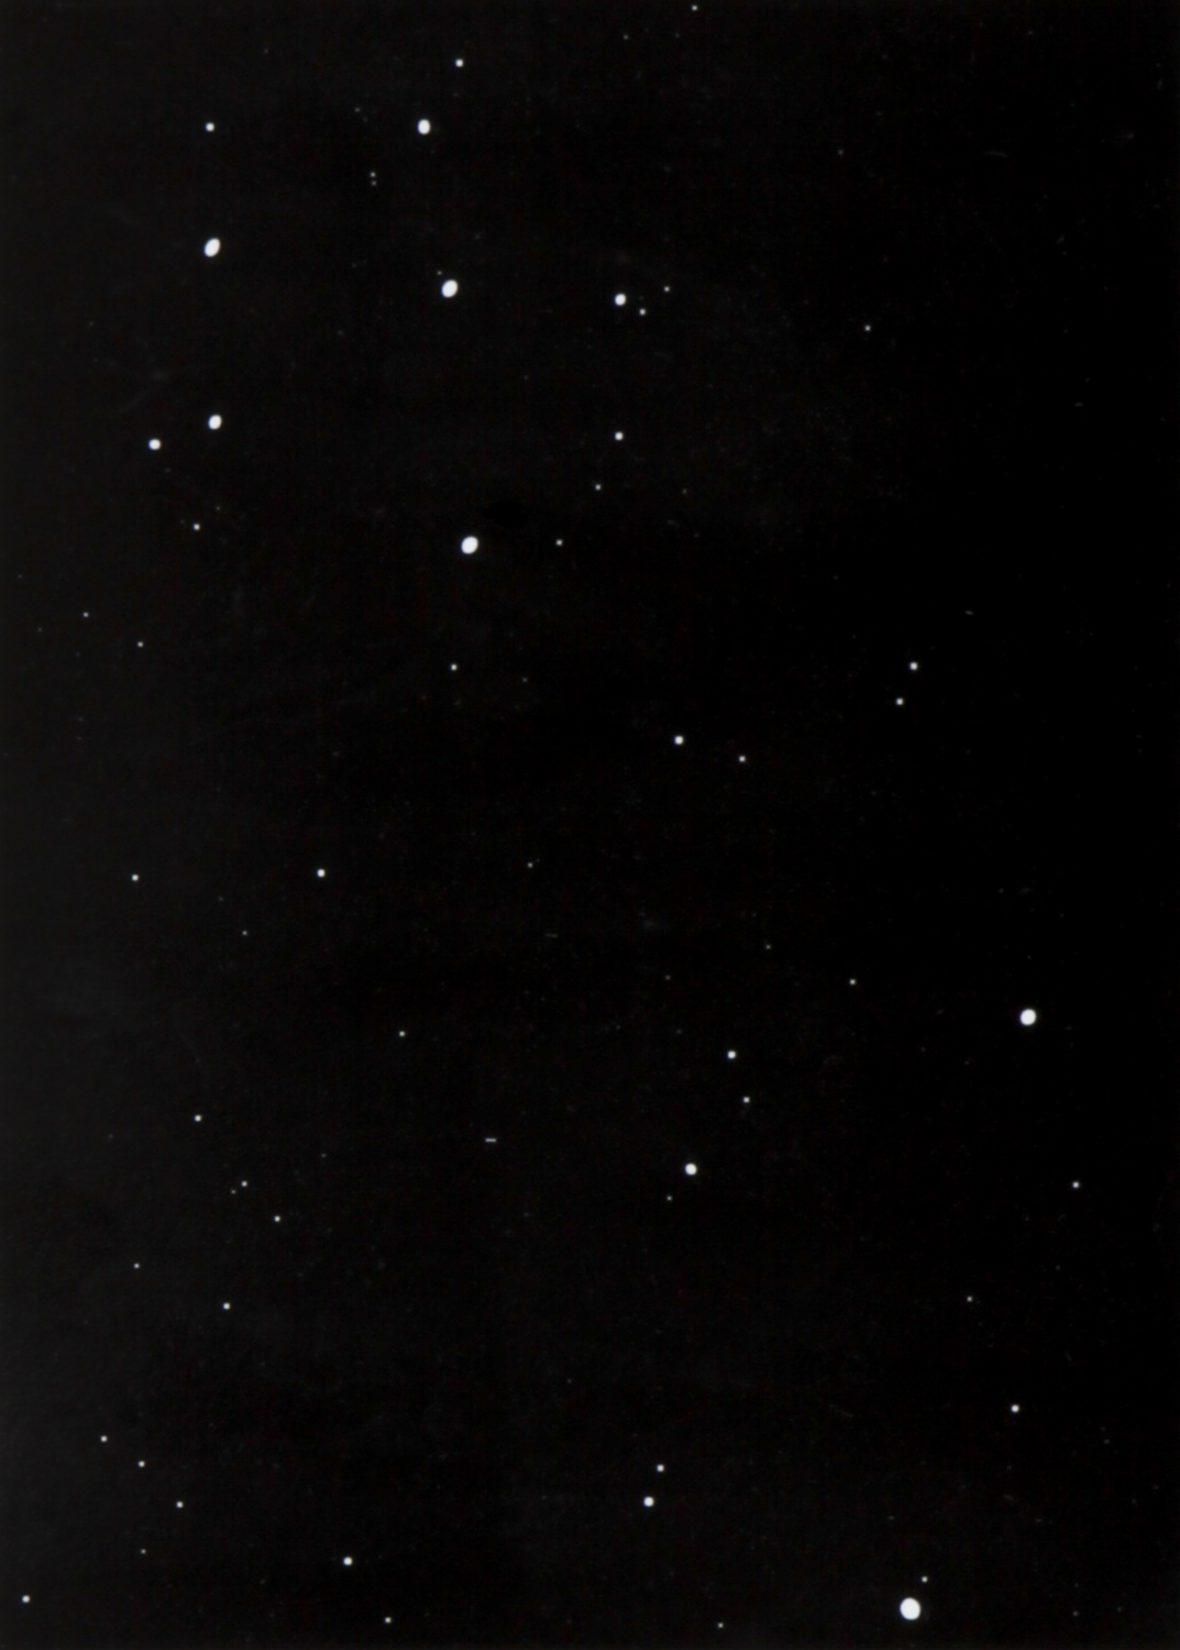 2018, Silbergelatineprint, 16cm x 11cm, Unikat